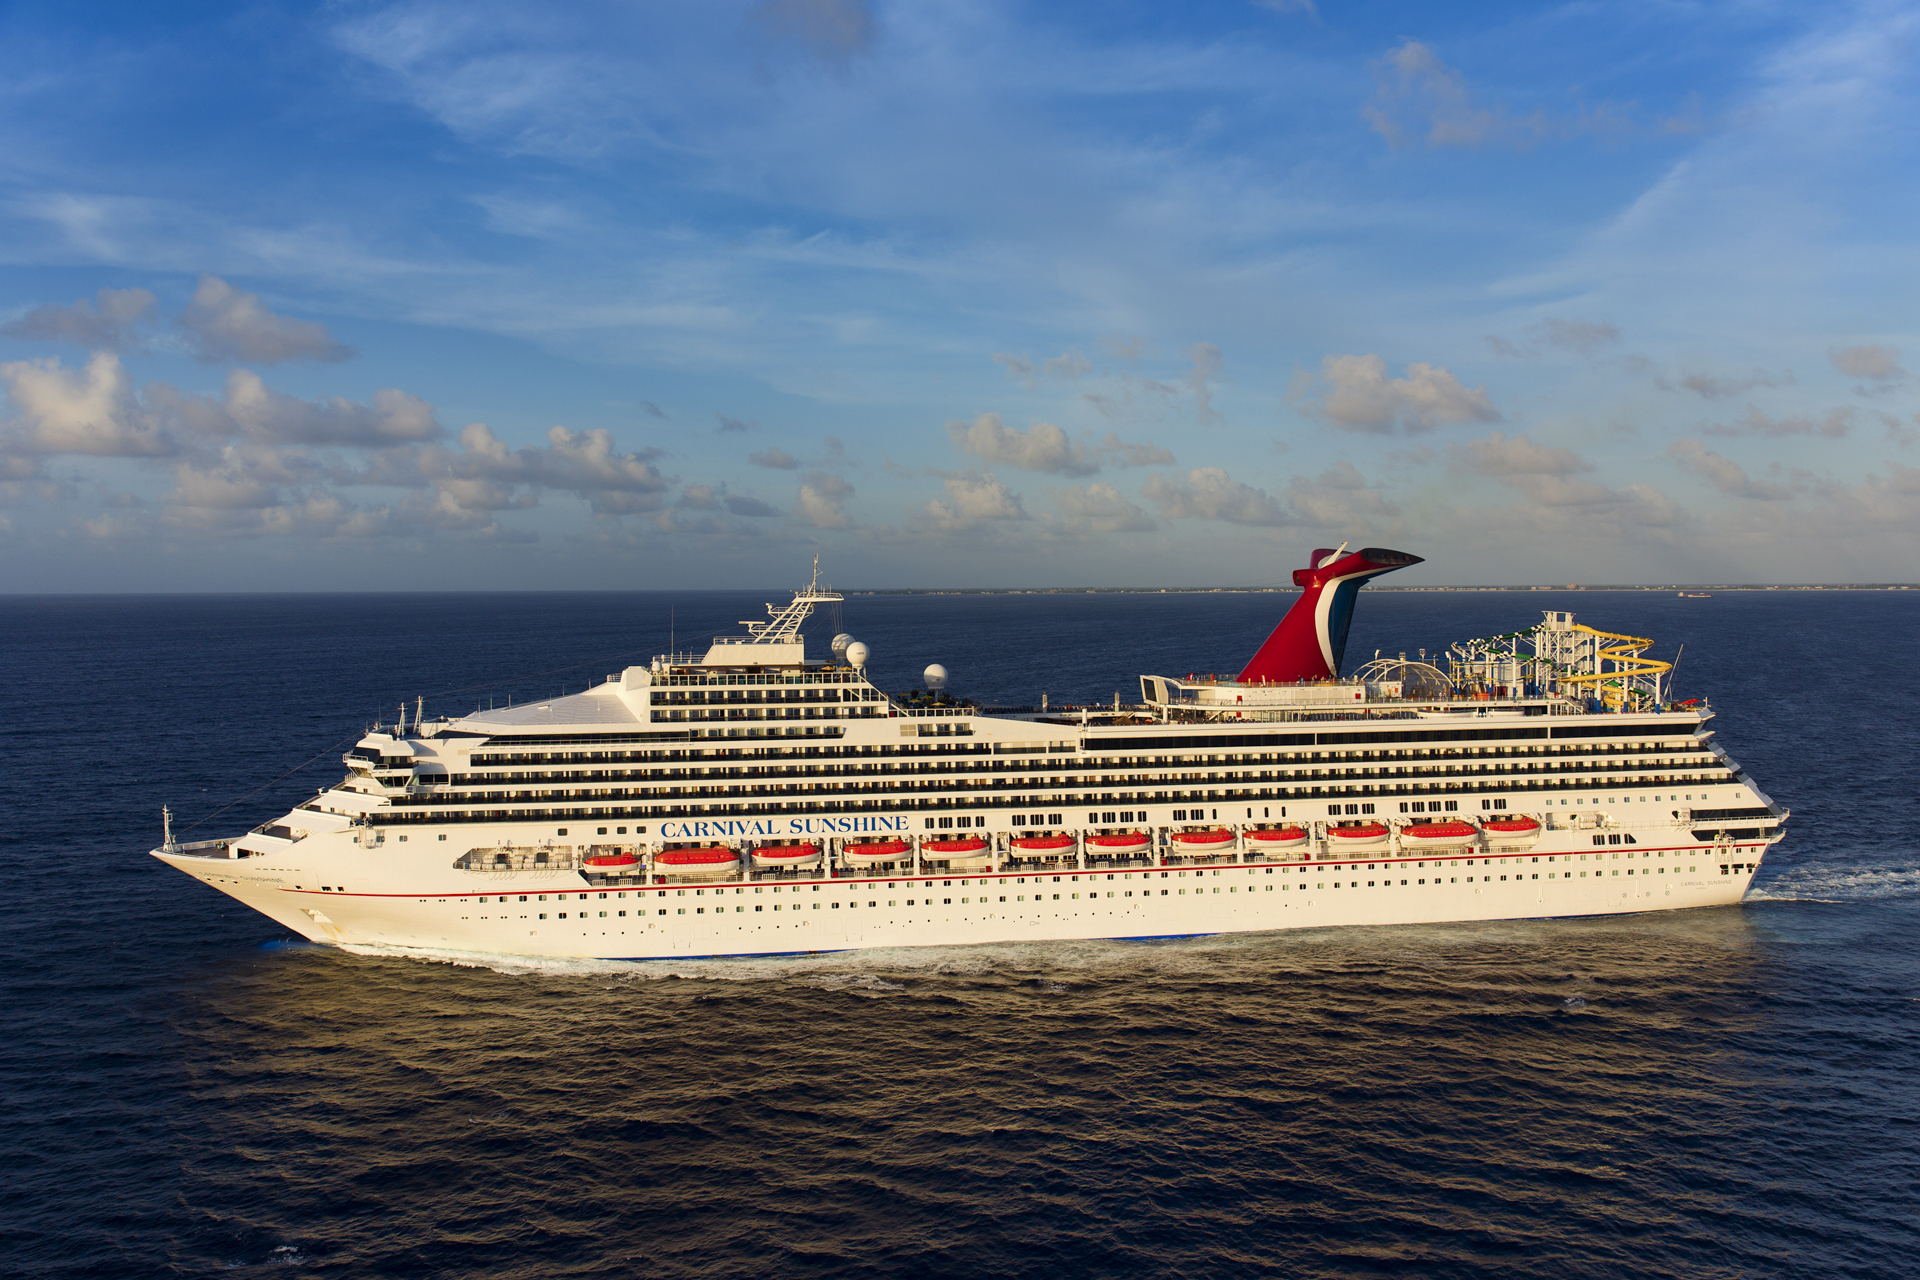 Carnival Sunshine Kicks Off New Year-Round Cruise Program from Port of Charleston